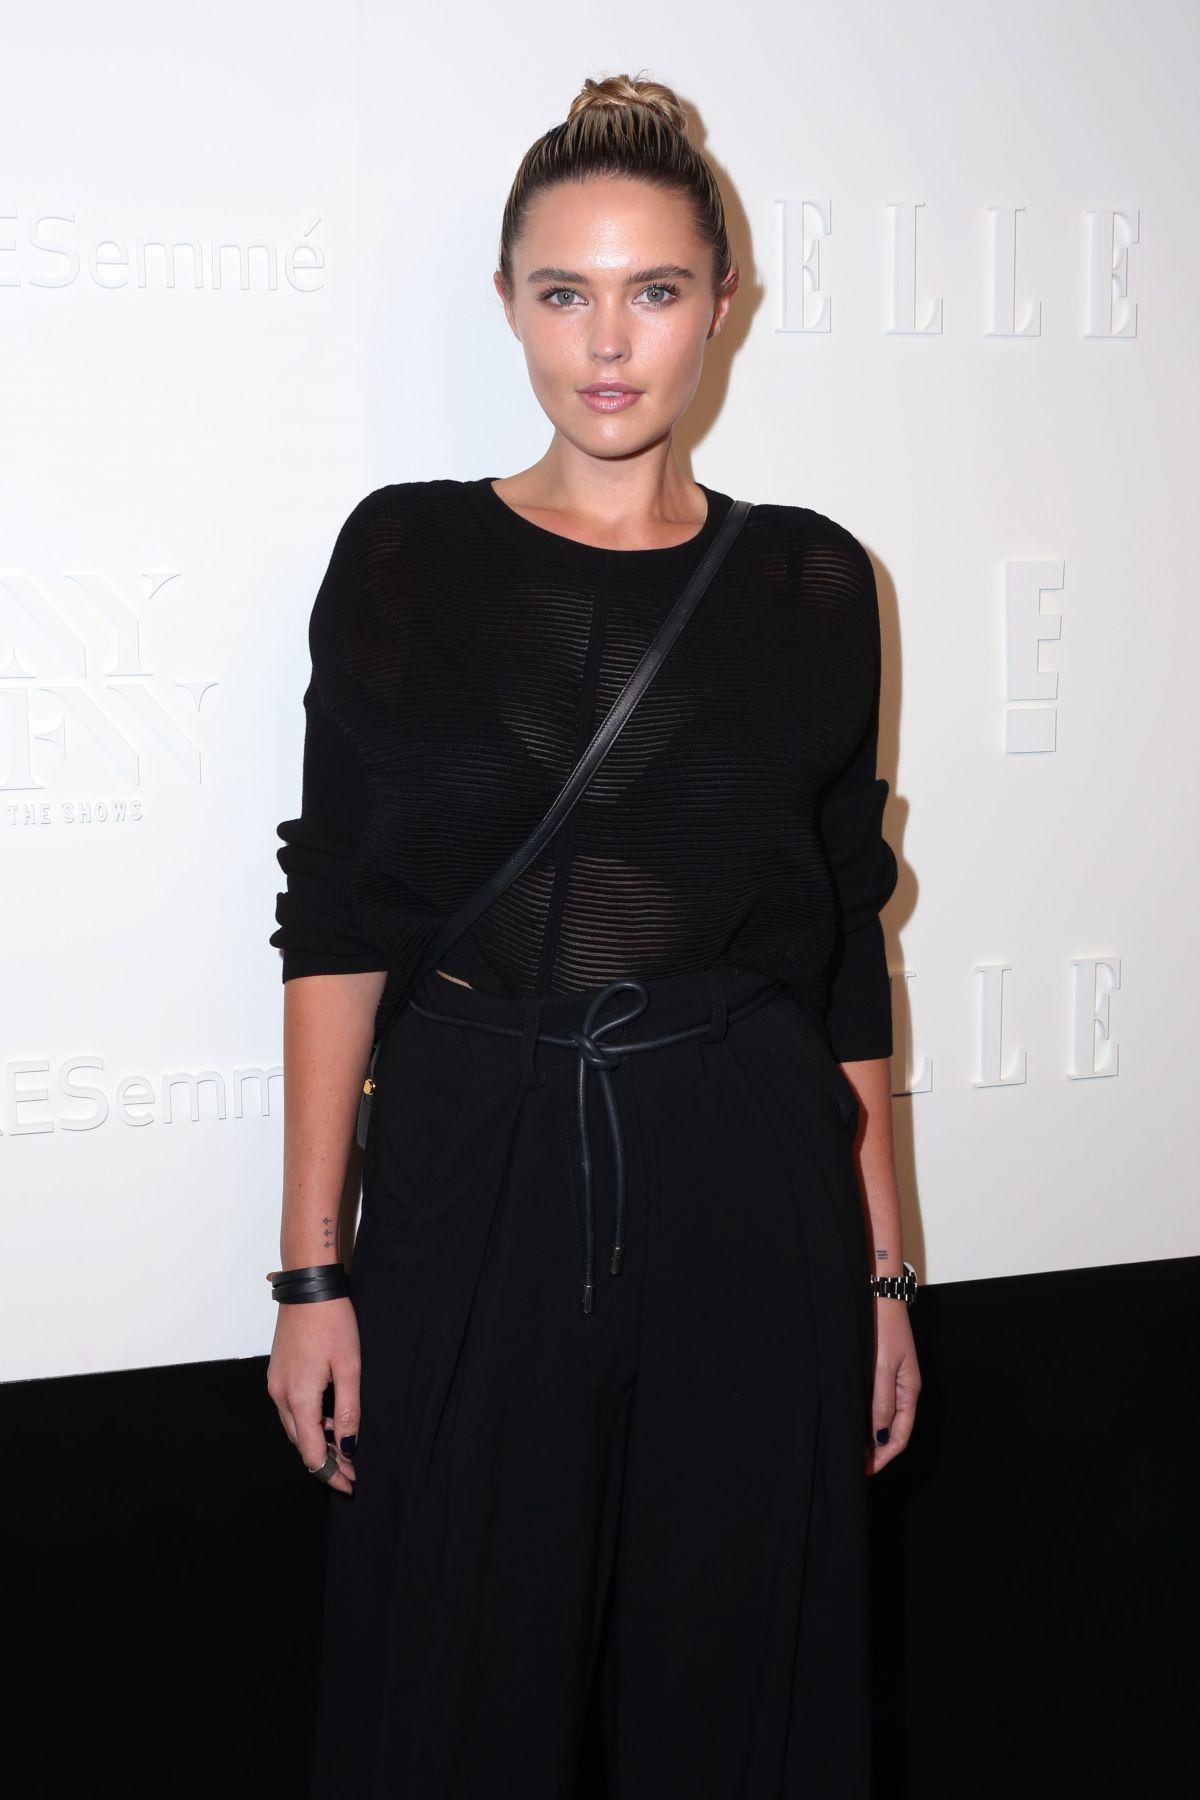 GEORGINA BURKE at E!, Elle & Img Host New York Fashion Week Kickoff Party 09/06/2017